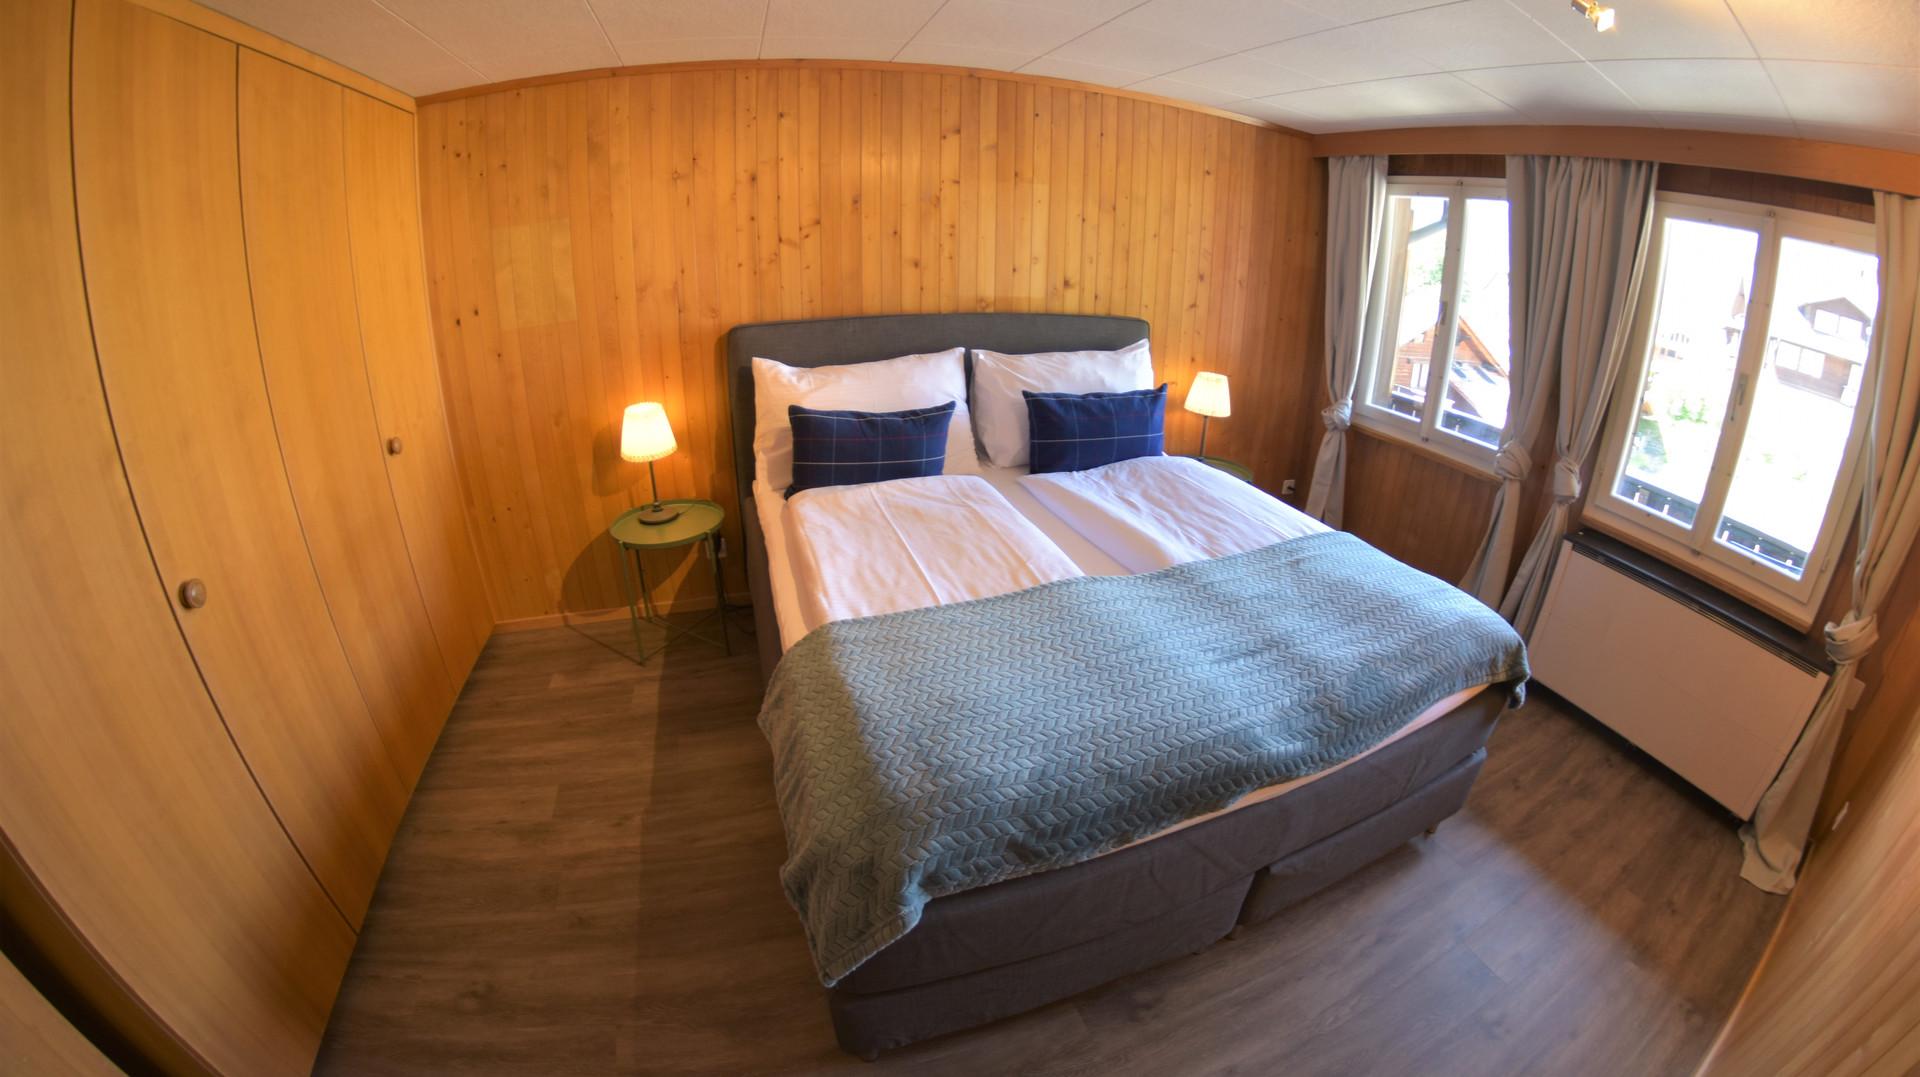 Jungfrau_Schlafzimmer1.jpg